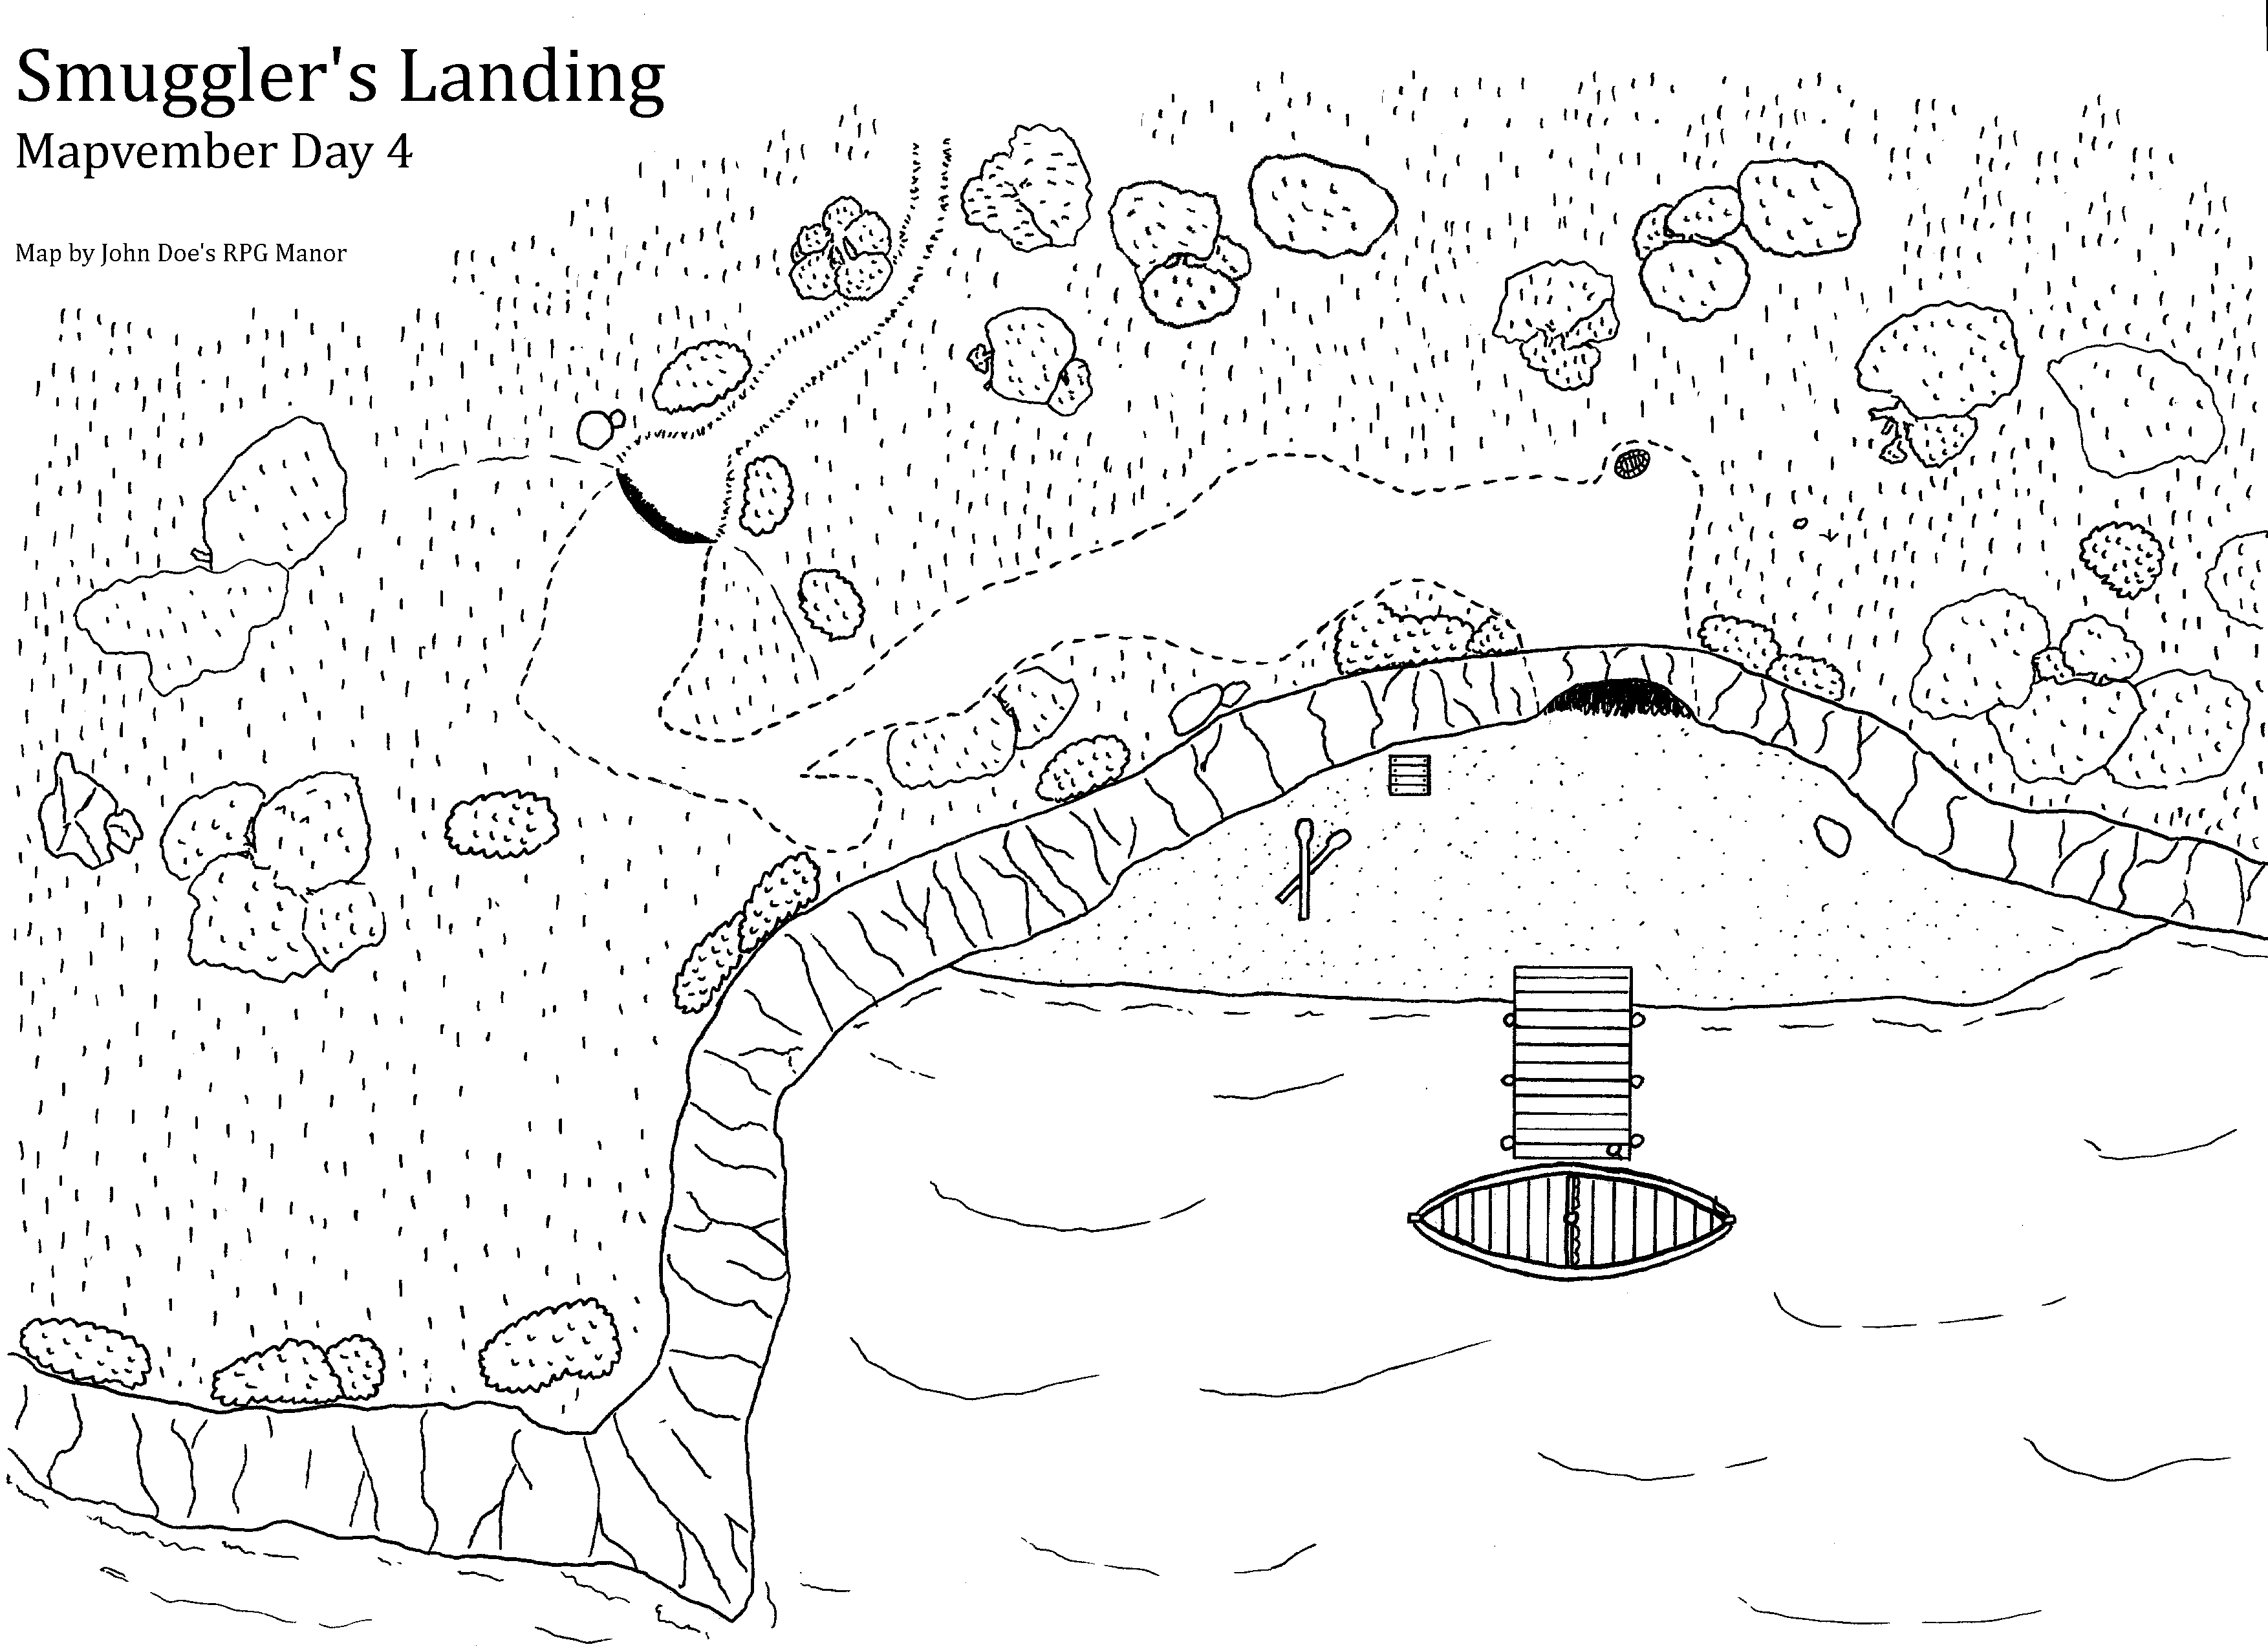 mapvember-day-4-landing